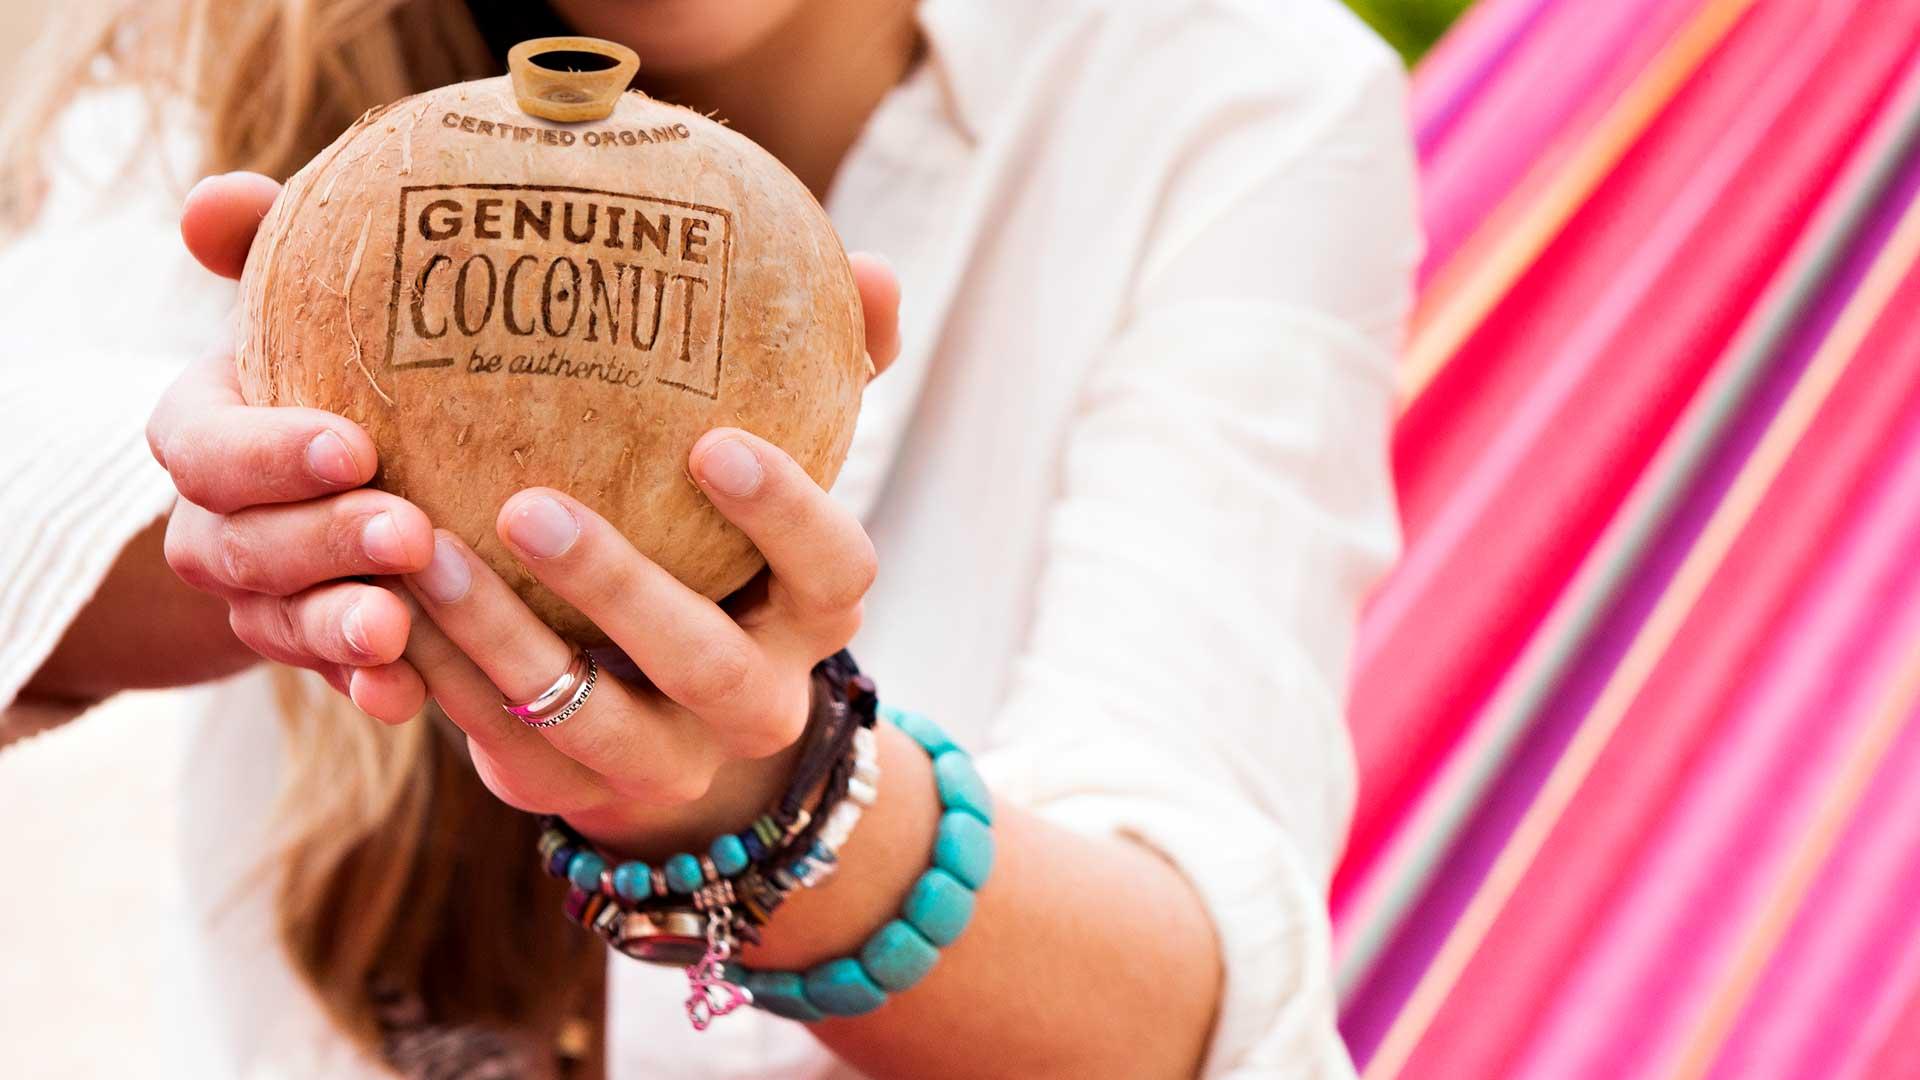 agua de coco genuine coconut salud energia